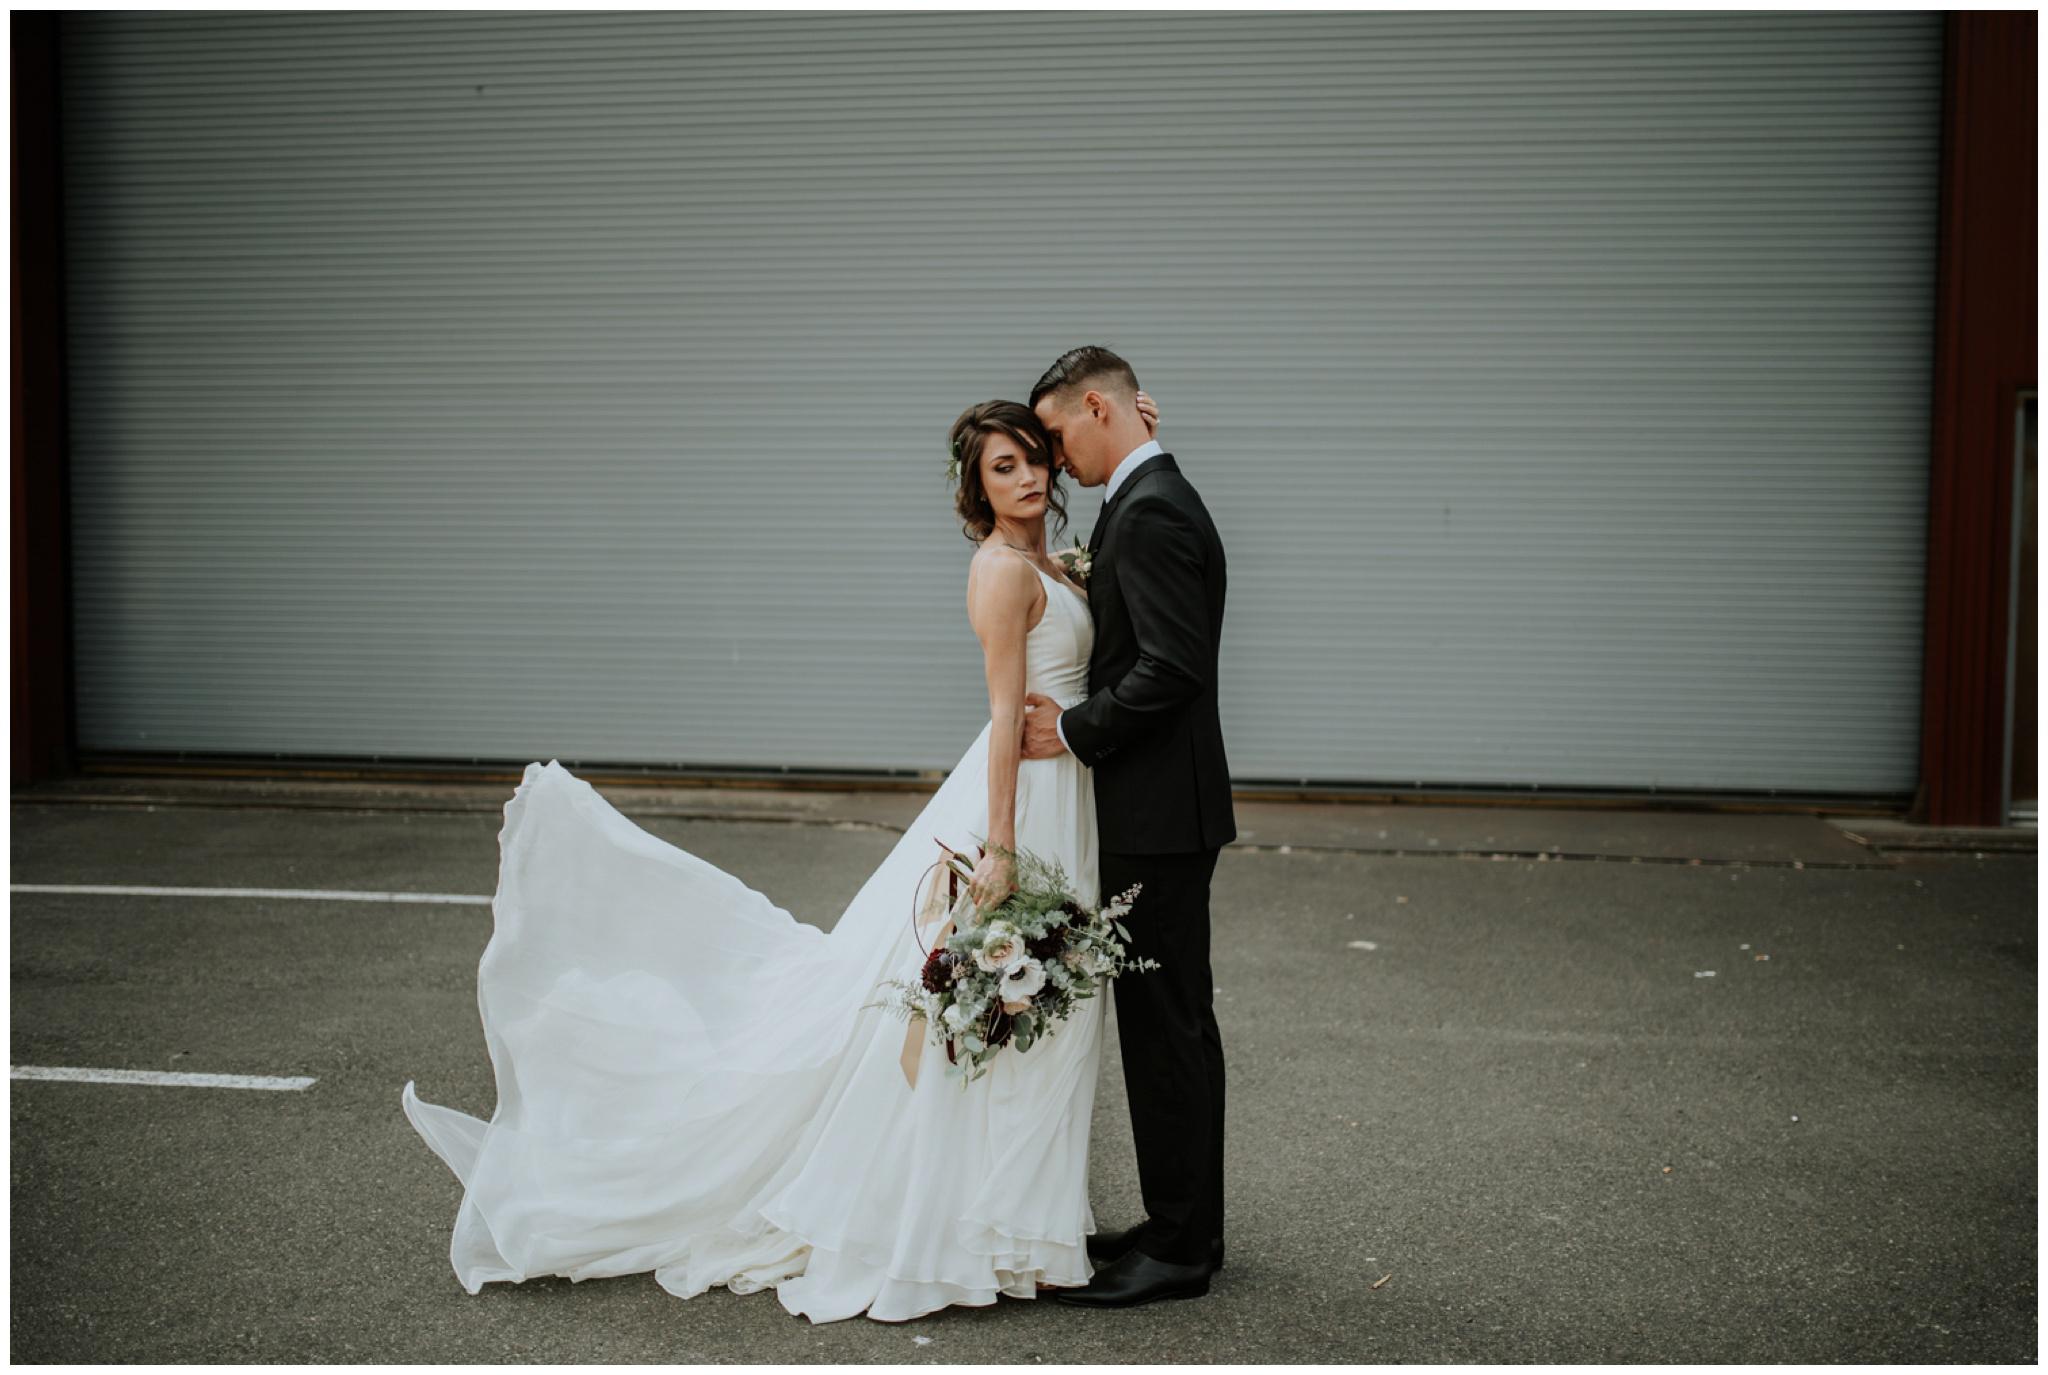 alyssa-keiran-westland-distillery-urban-seattle-wedding-photographer-caitlyn-nikula-64.jpg